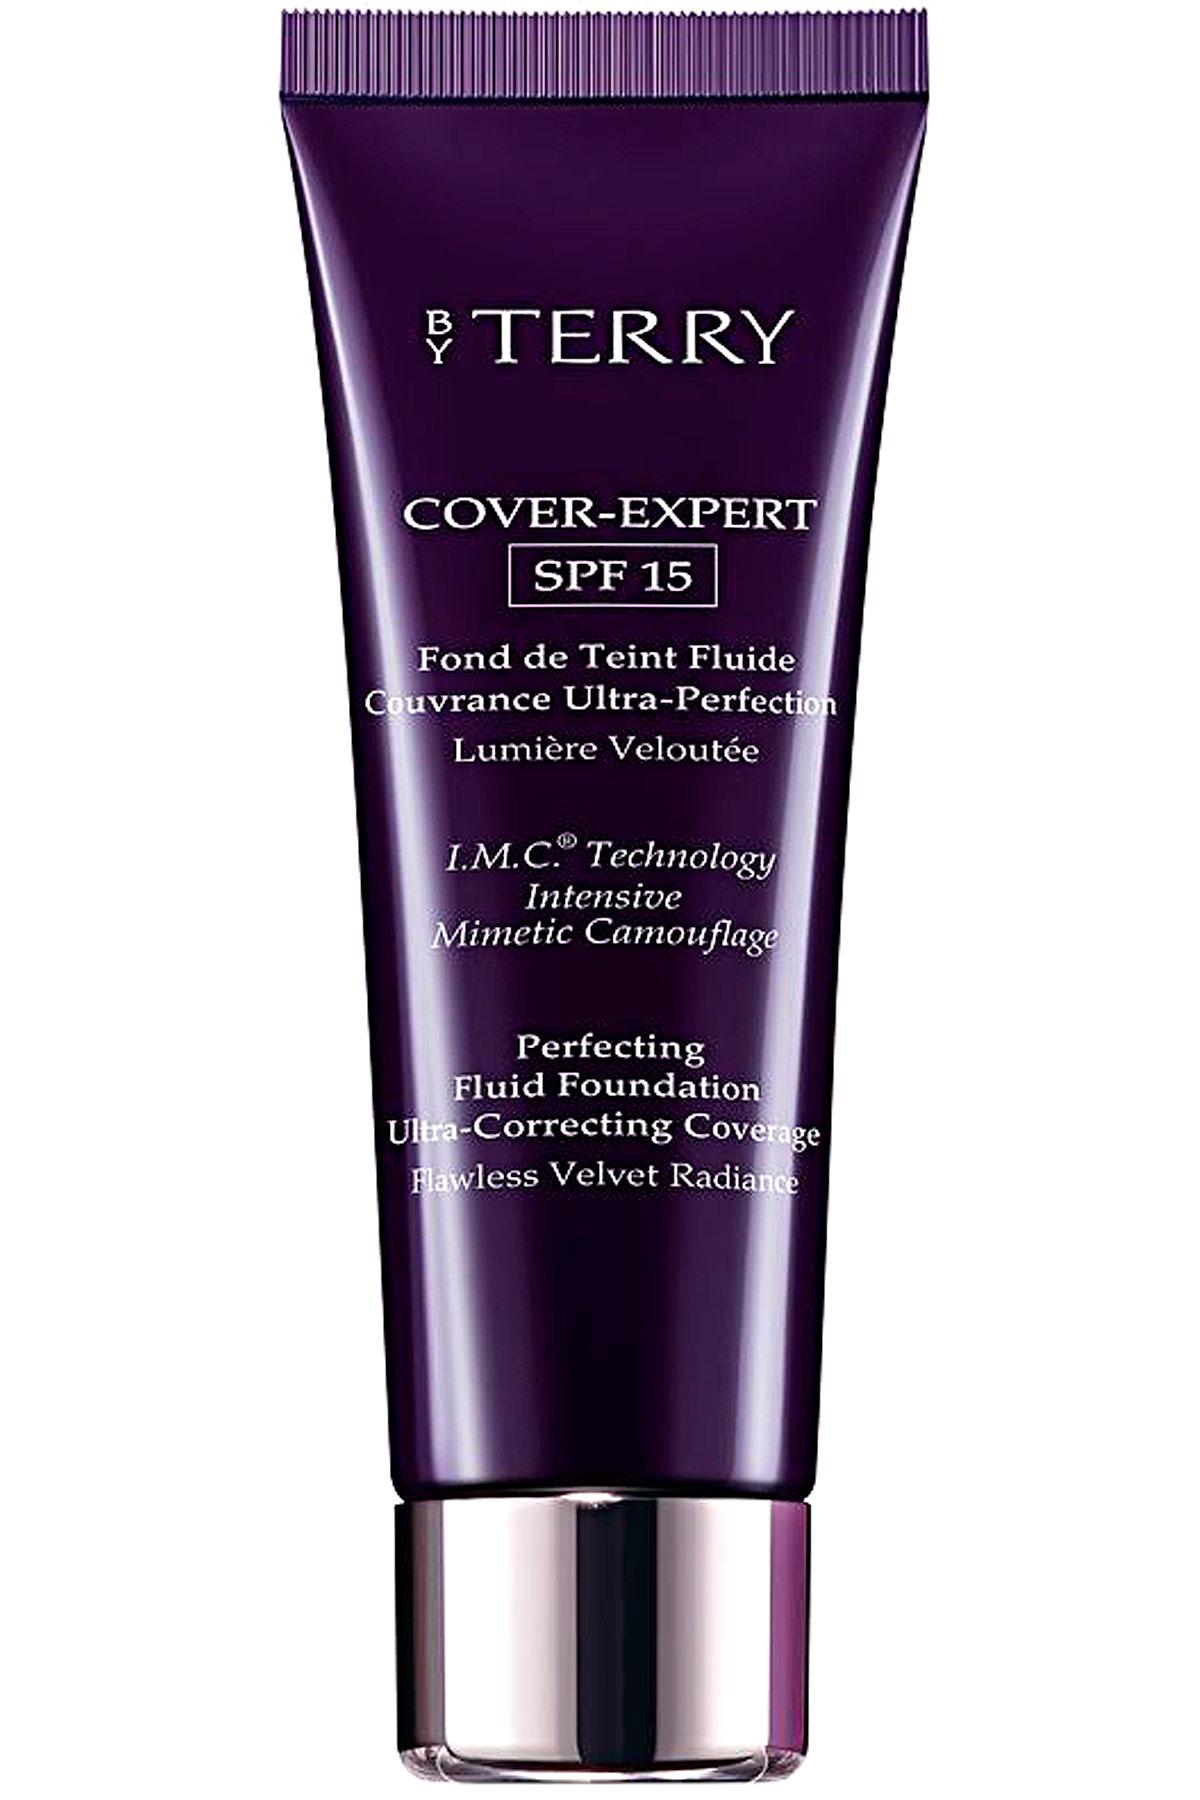 By Terry Makeup for Women, Cover-expert Spf15 - N.1 Fair Beige - 35 Ml, Fair Beige, 2019, 35 ml